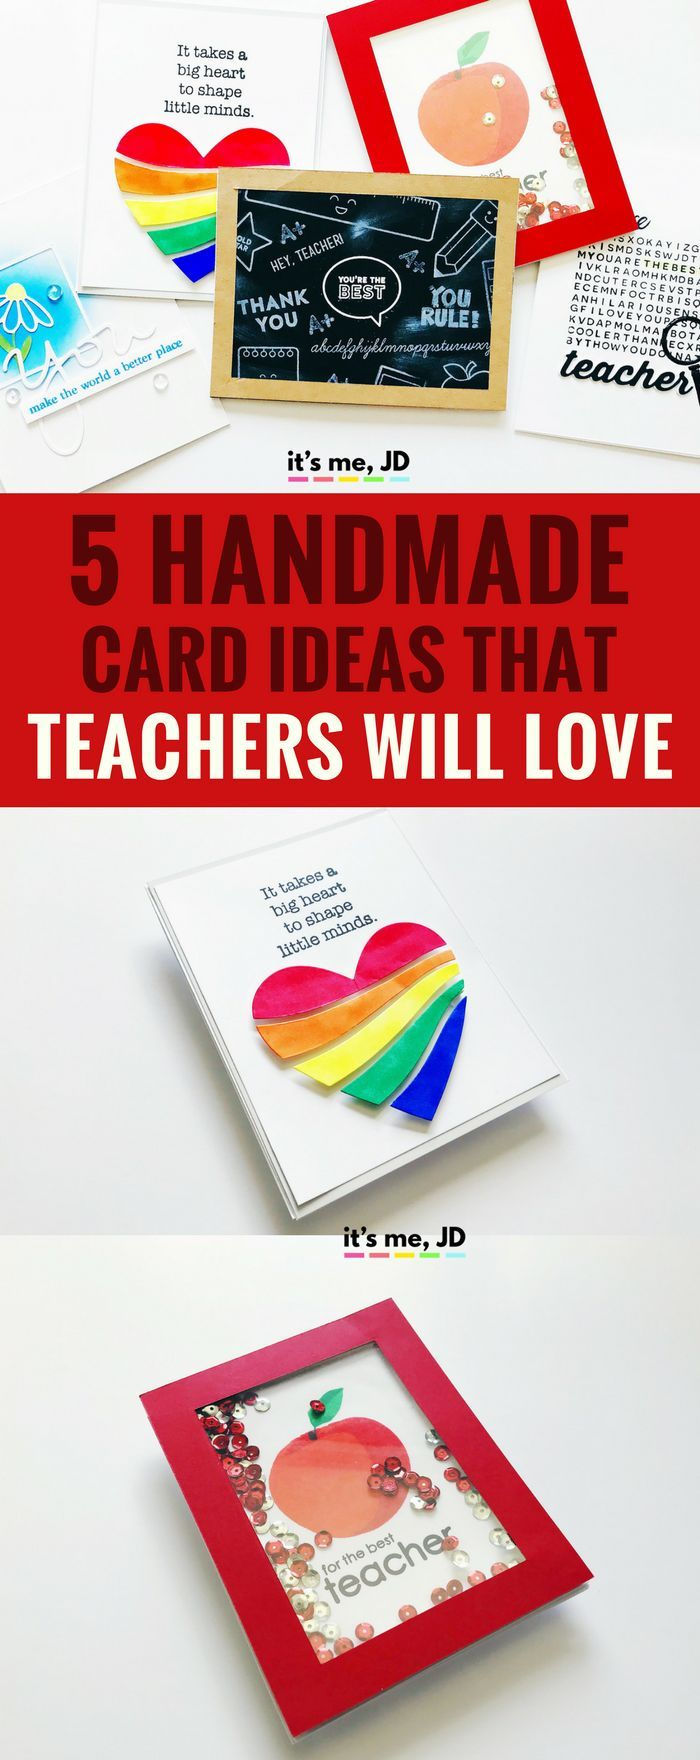 5 handmade card ideas that teachers will love  diy cards